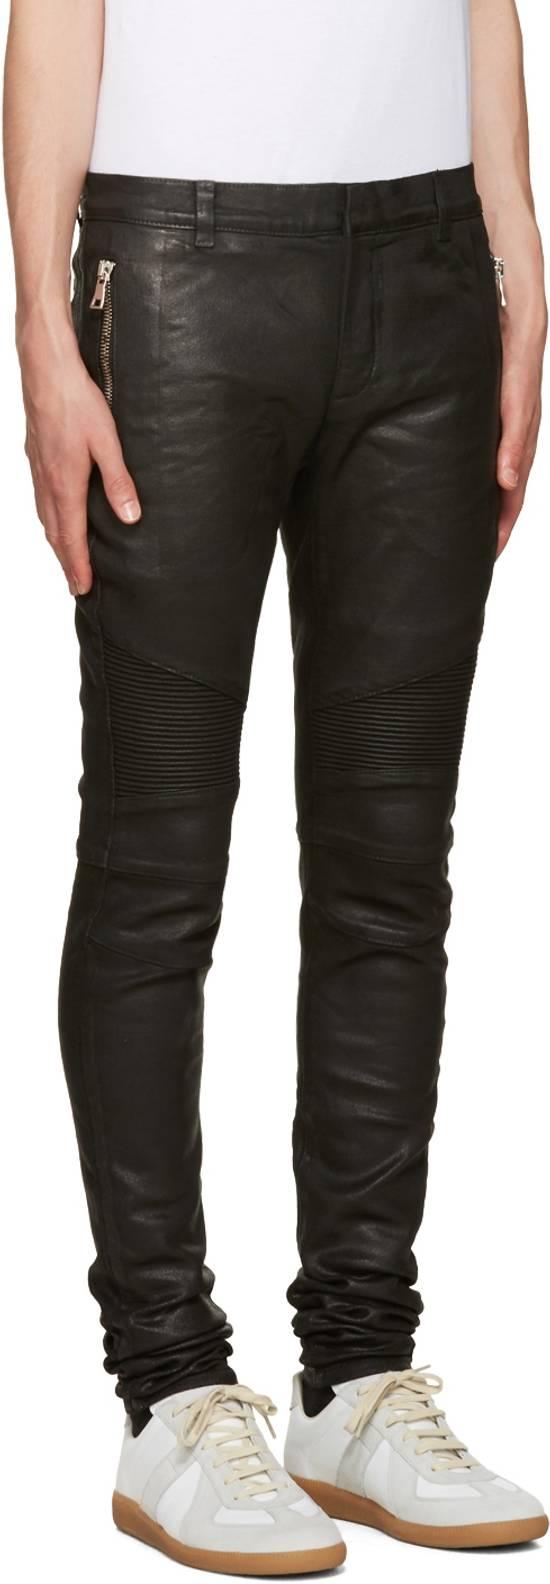 Balmain 1265$ Skinny Coated Stretch Denim Biker Jeans Size US 27 - 1